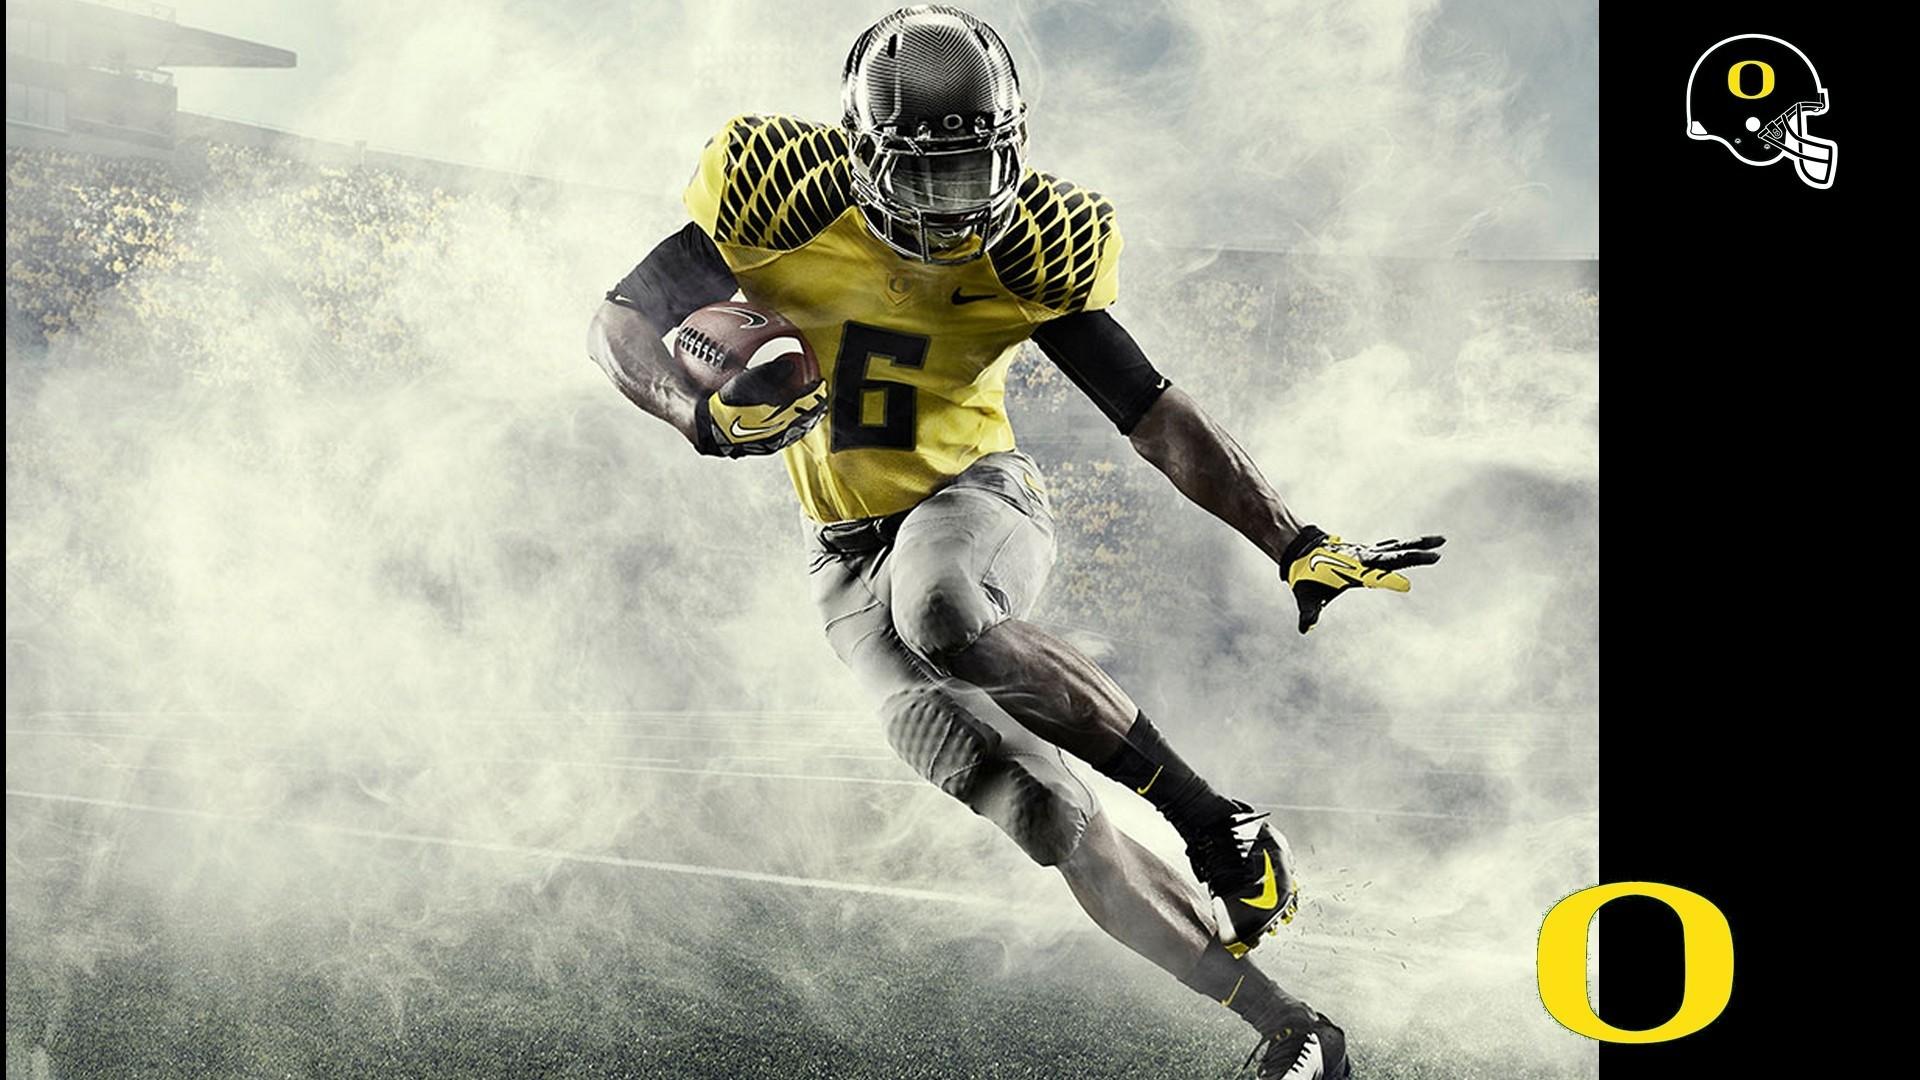 College Football Nike Wallpaper: Nike American Football Wallpapers (51+ Images